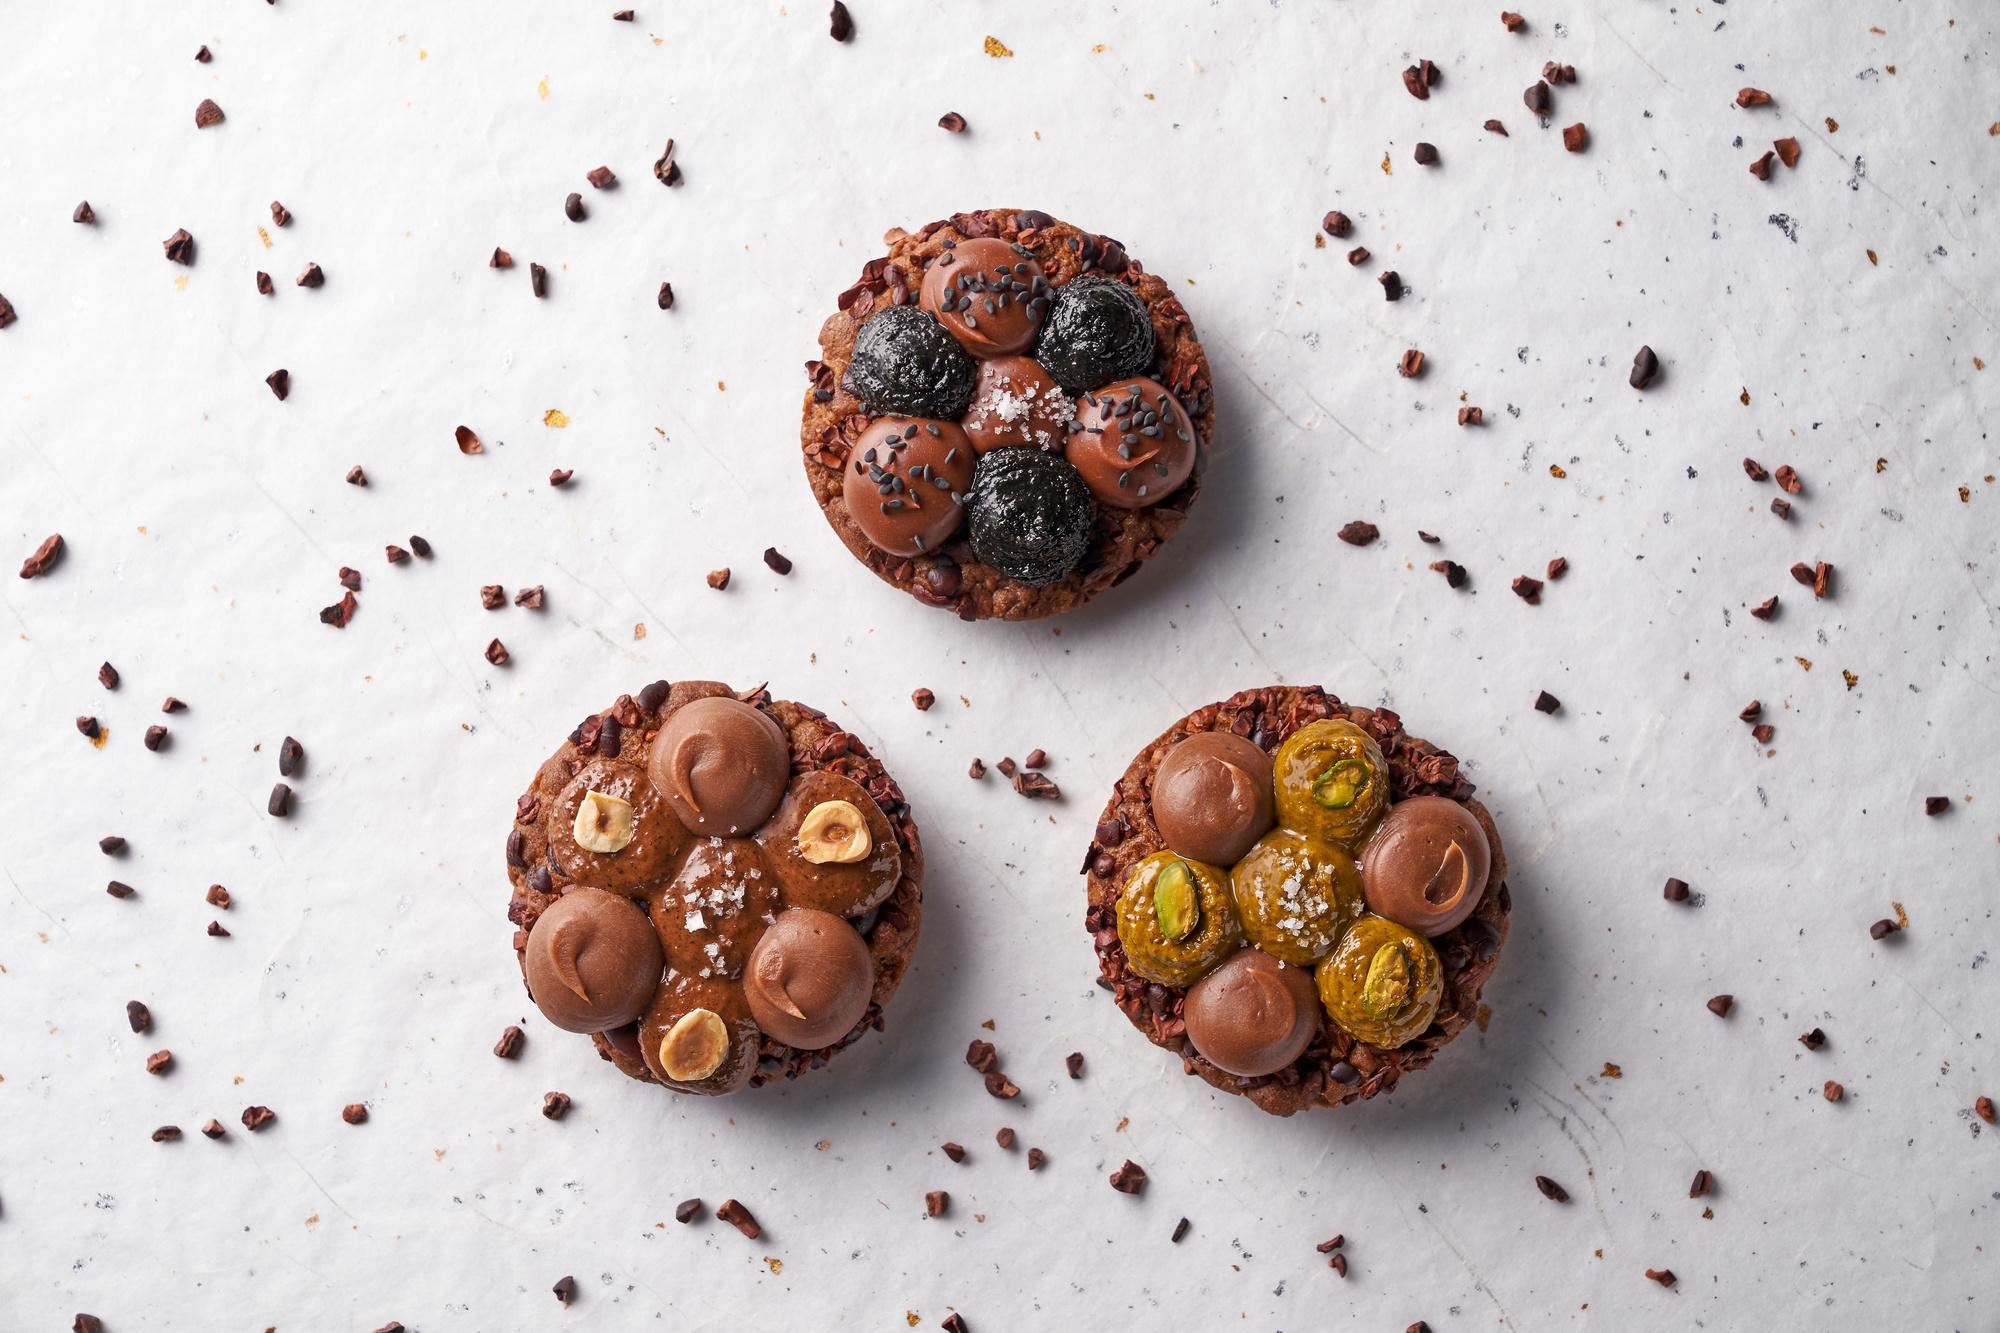 Les cookies garnis de Benoit Nihant, DR